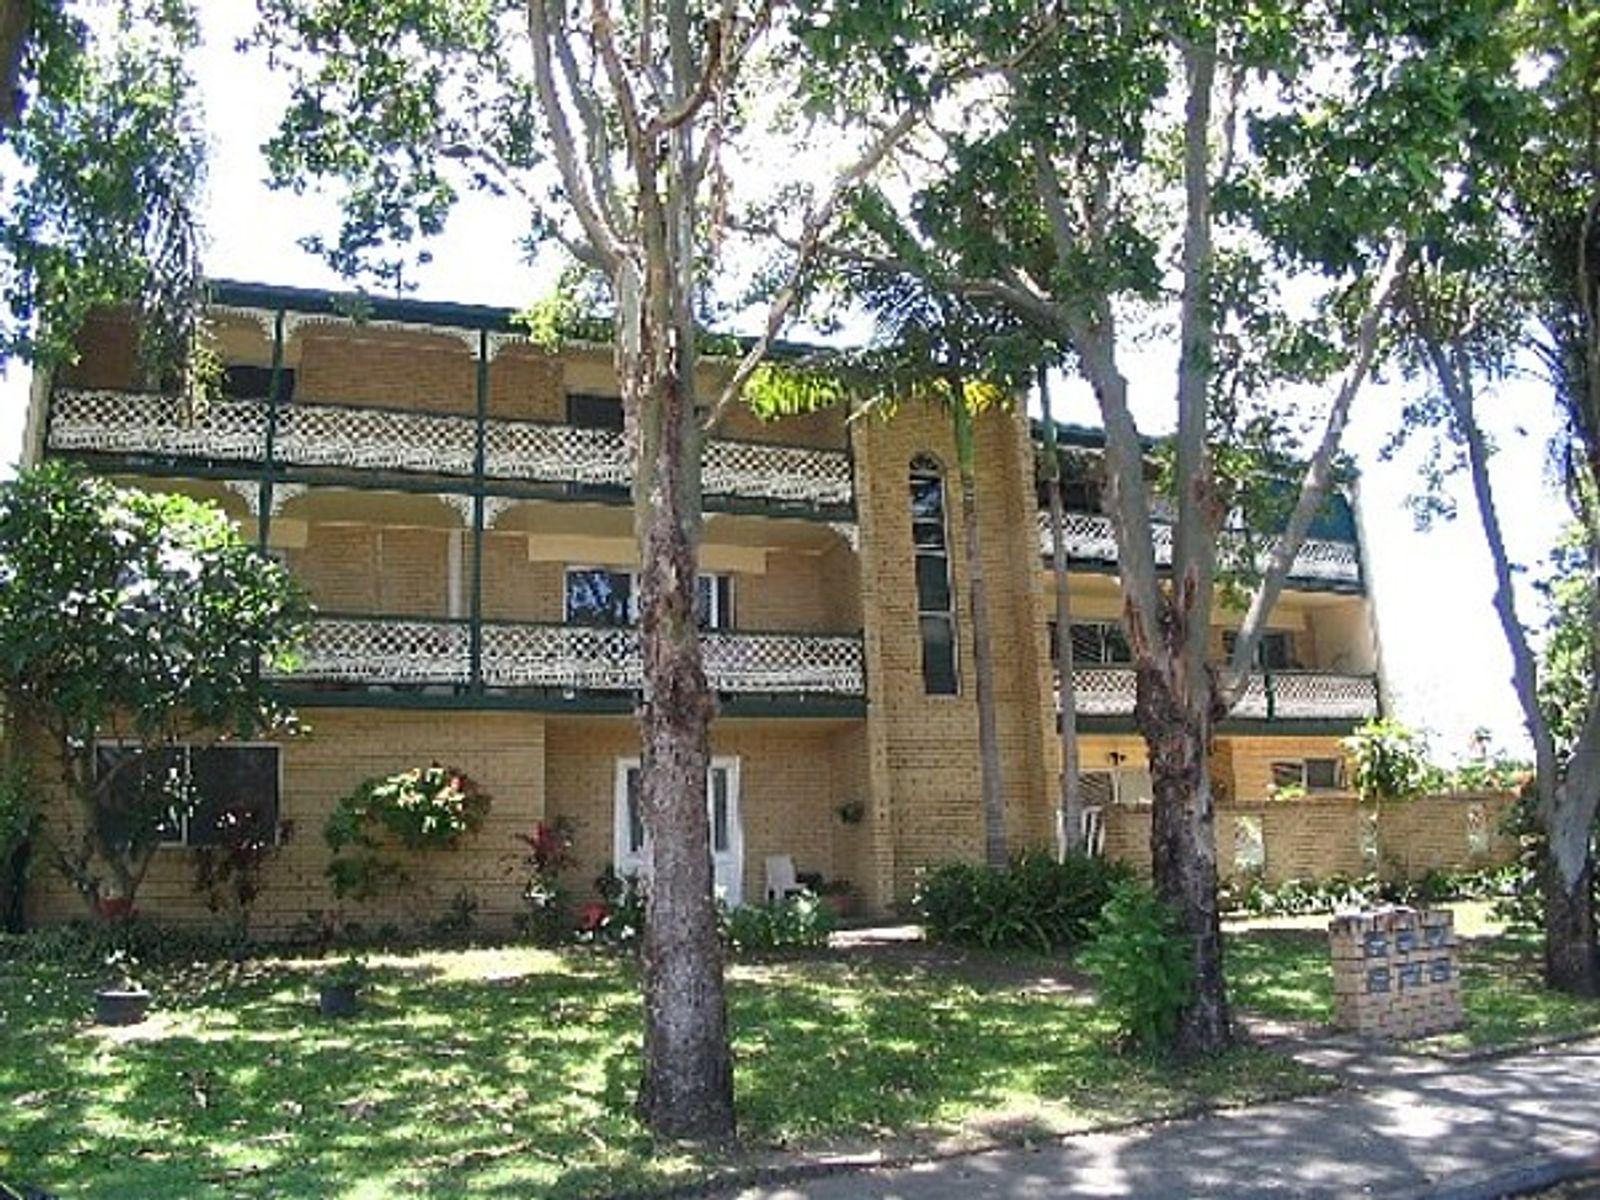 4/35 T E Peters Drive, Broadbeach Waters, QLD 4218